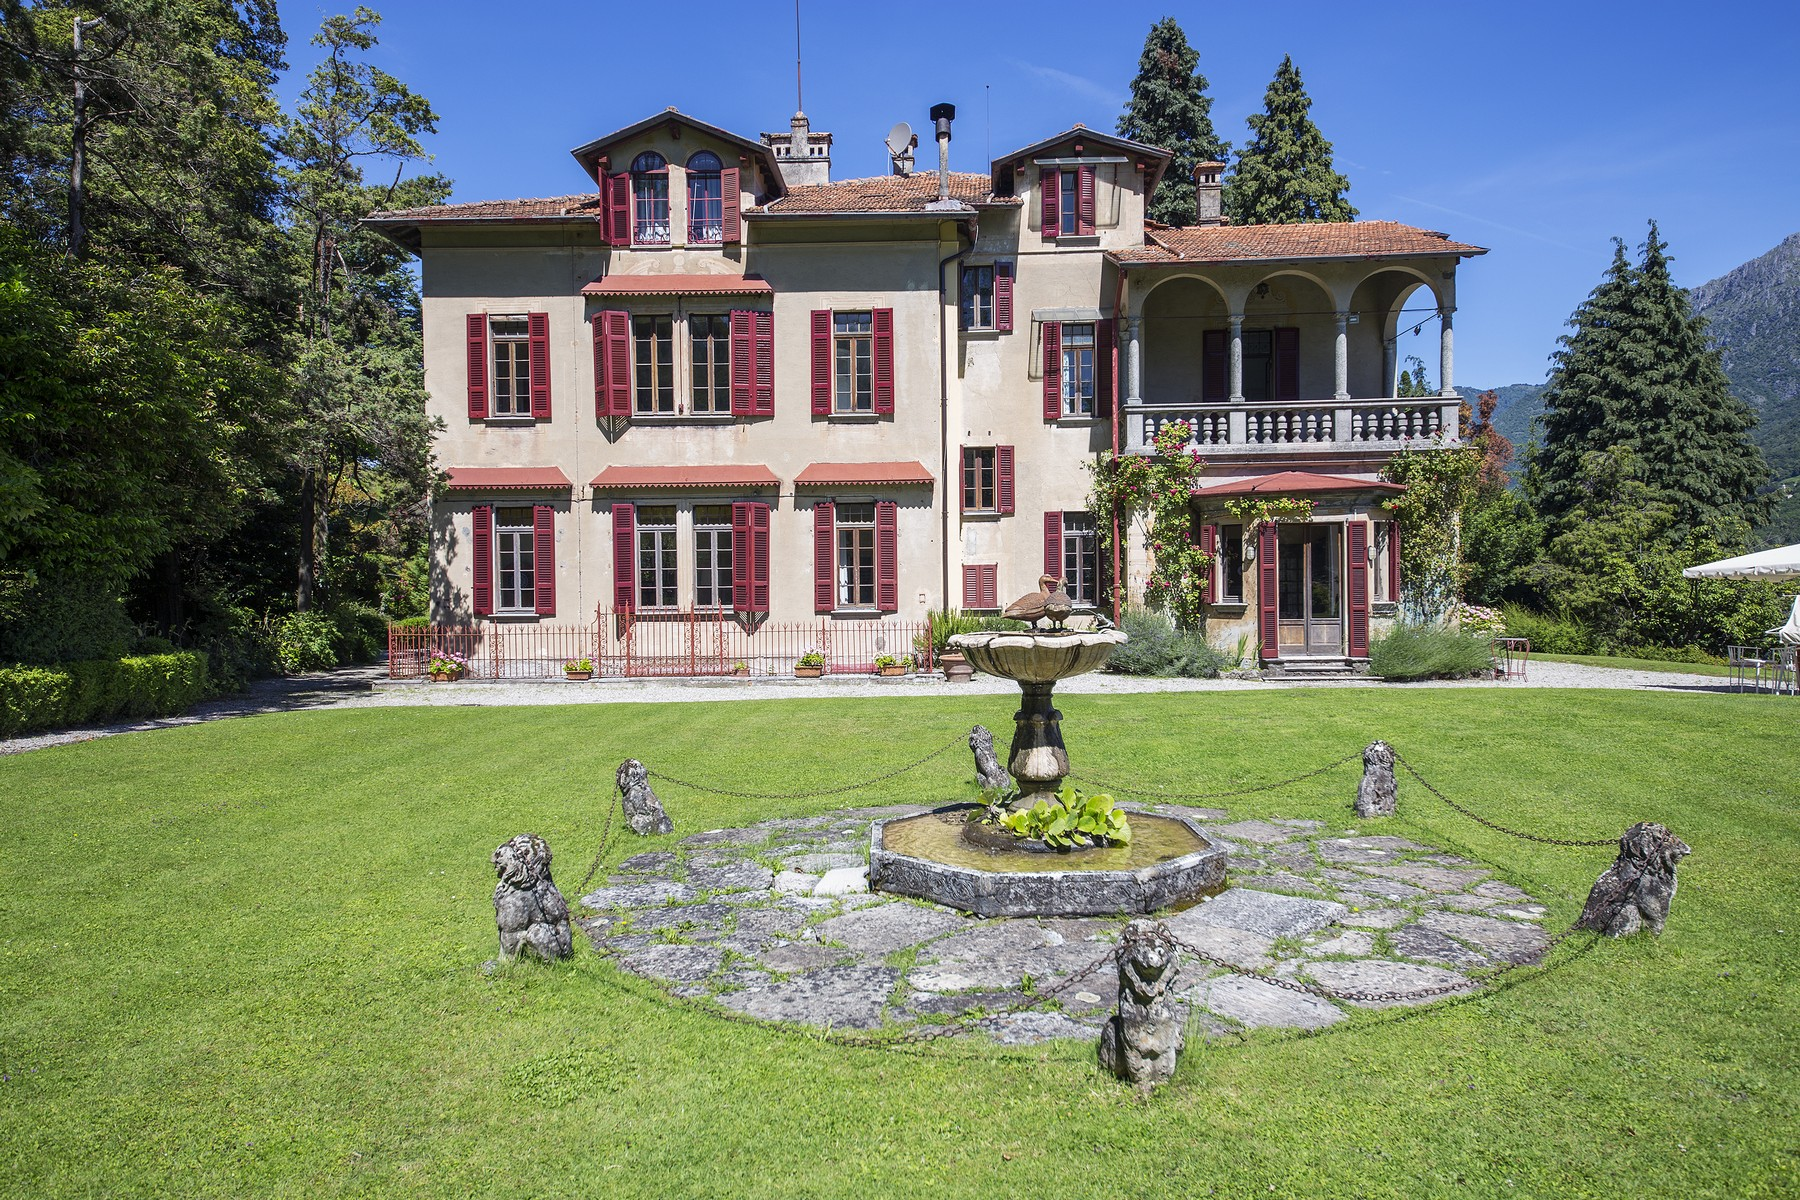 Single Family Home for Sale at Wonderful villa with amazing lakeview Via Alfredo Wyatt Menaggio, Como 22017 Italy